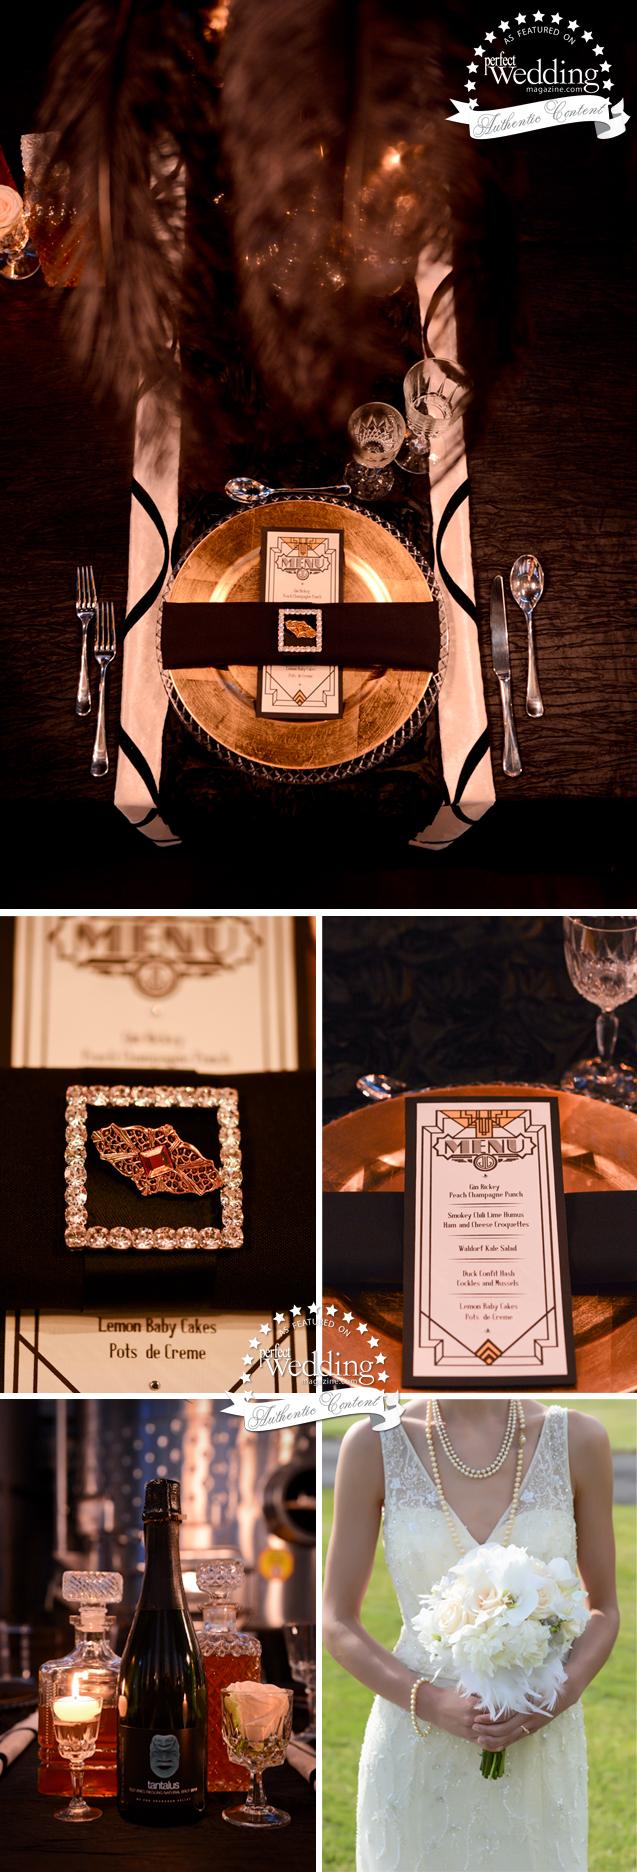 Tantalus Vineyards, Vintage Wedding Inspiration, Perfect Wedding Magazine, Eyes of Le Stage, Wedding in Vineyards